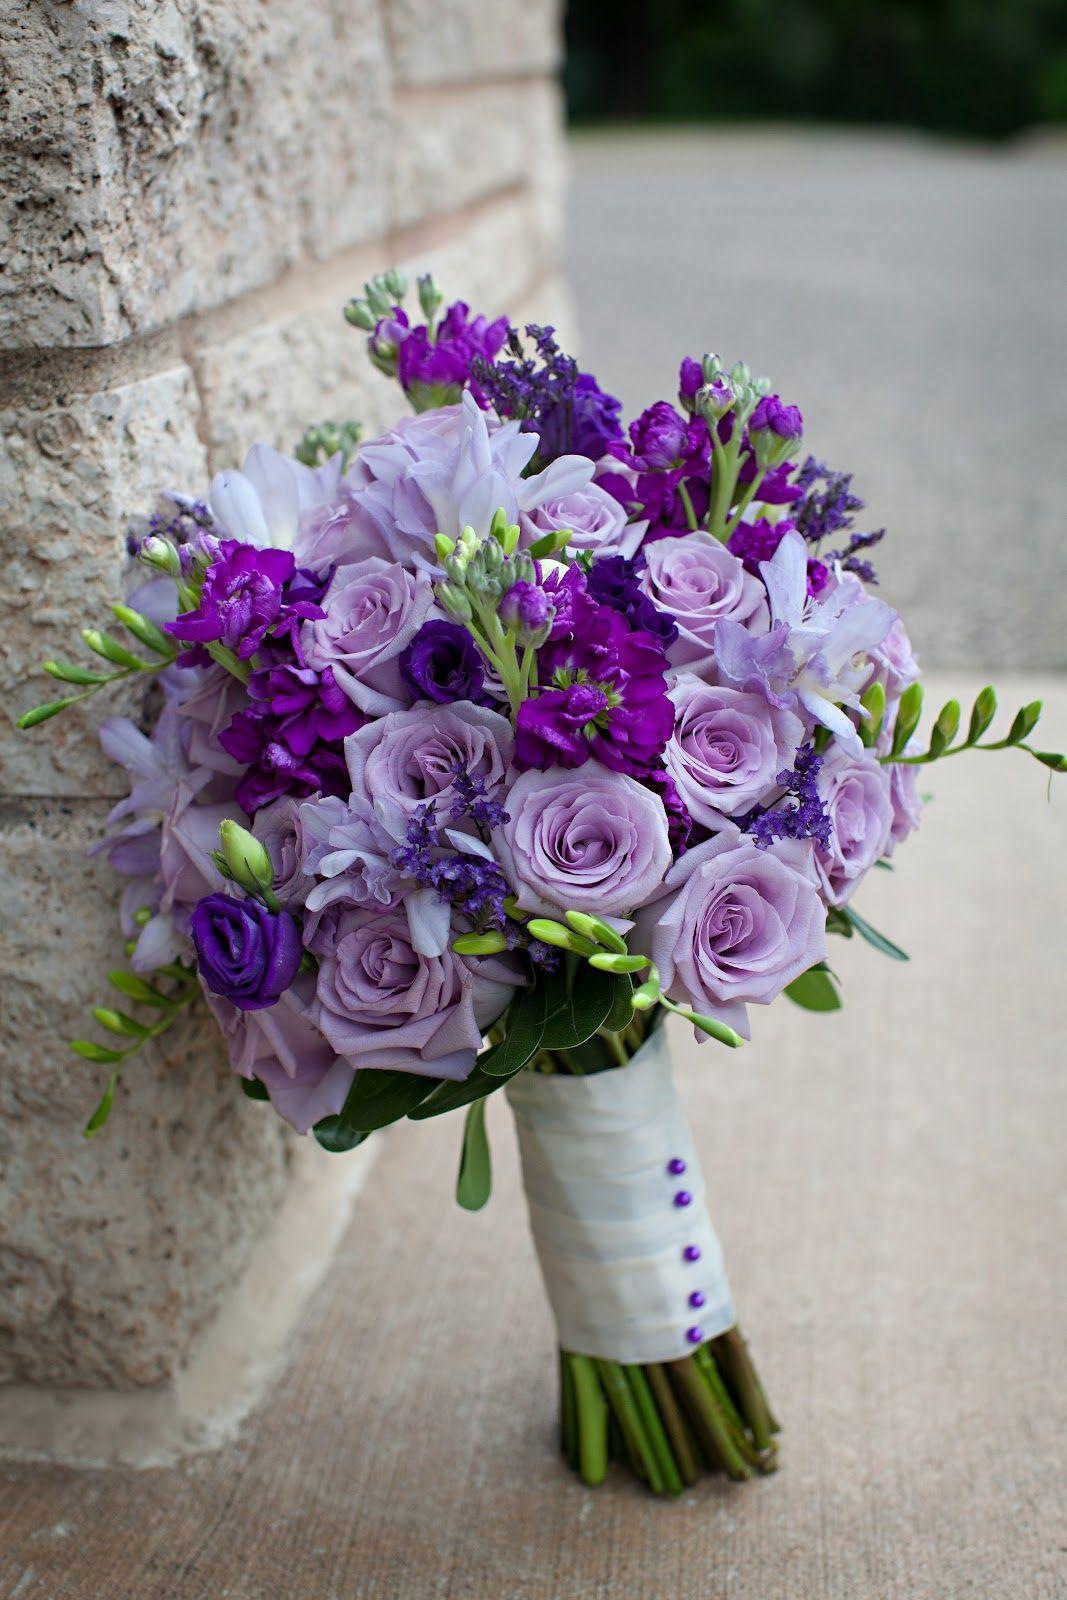 Final0136 1908588412 og 10671600 pixels dream fall wedding kmb floral may purple wedding lisianthus freesia izmirmasajfo